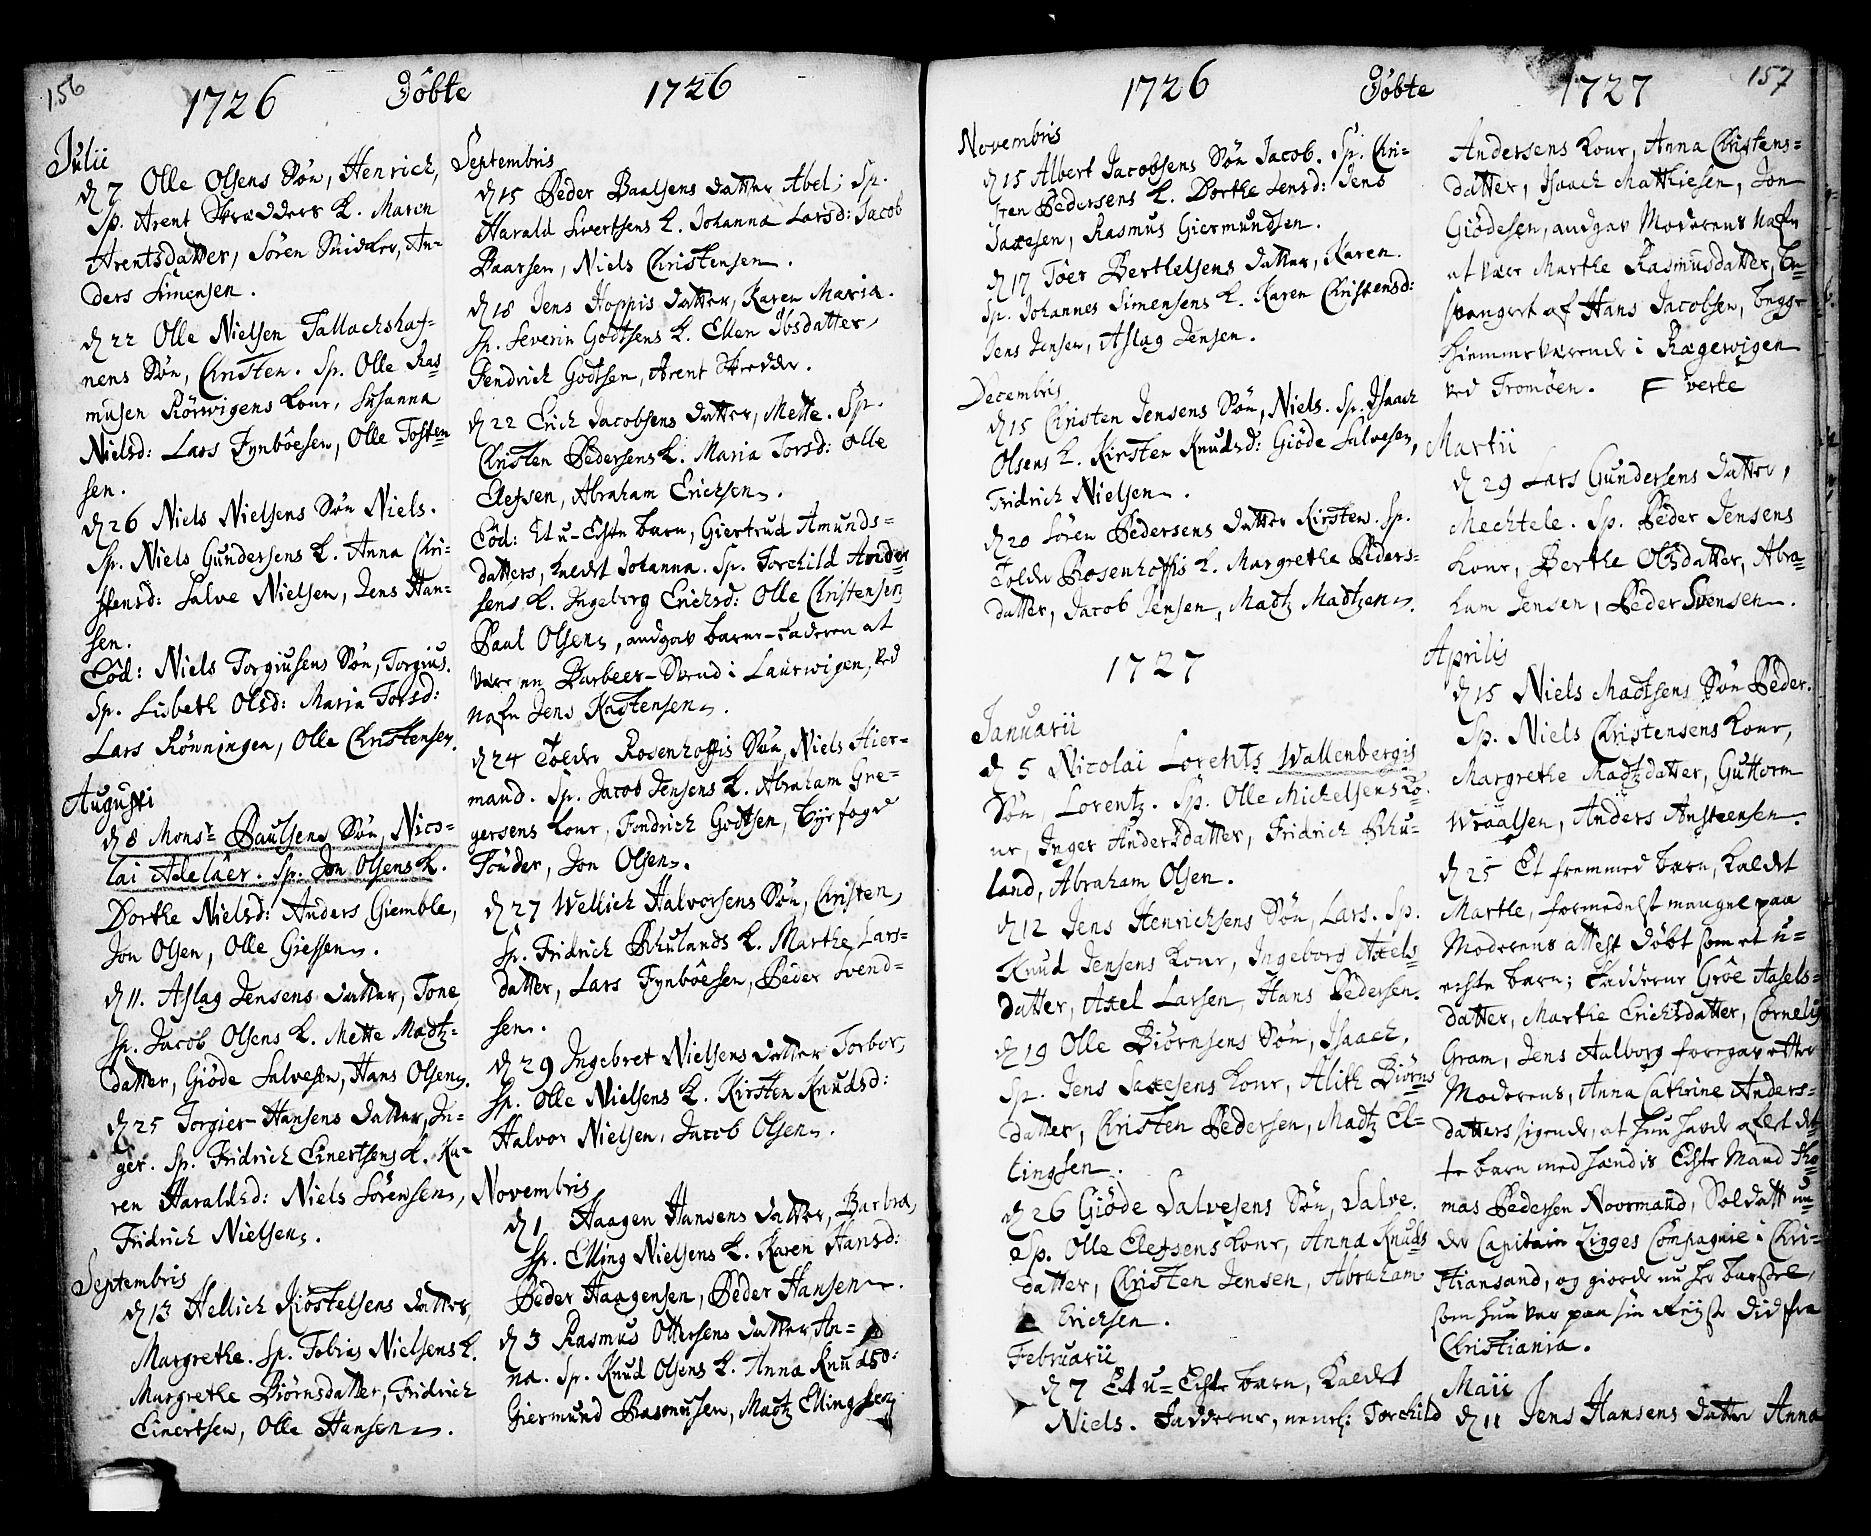 SAKO, Kragerø kirkebøker, F/Fa/L0001: Ministerialbok nr. 1, 1702-1766, s. 156-157